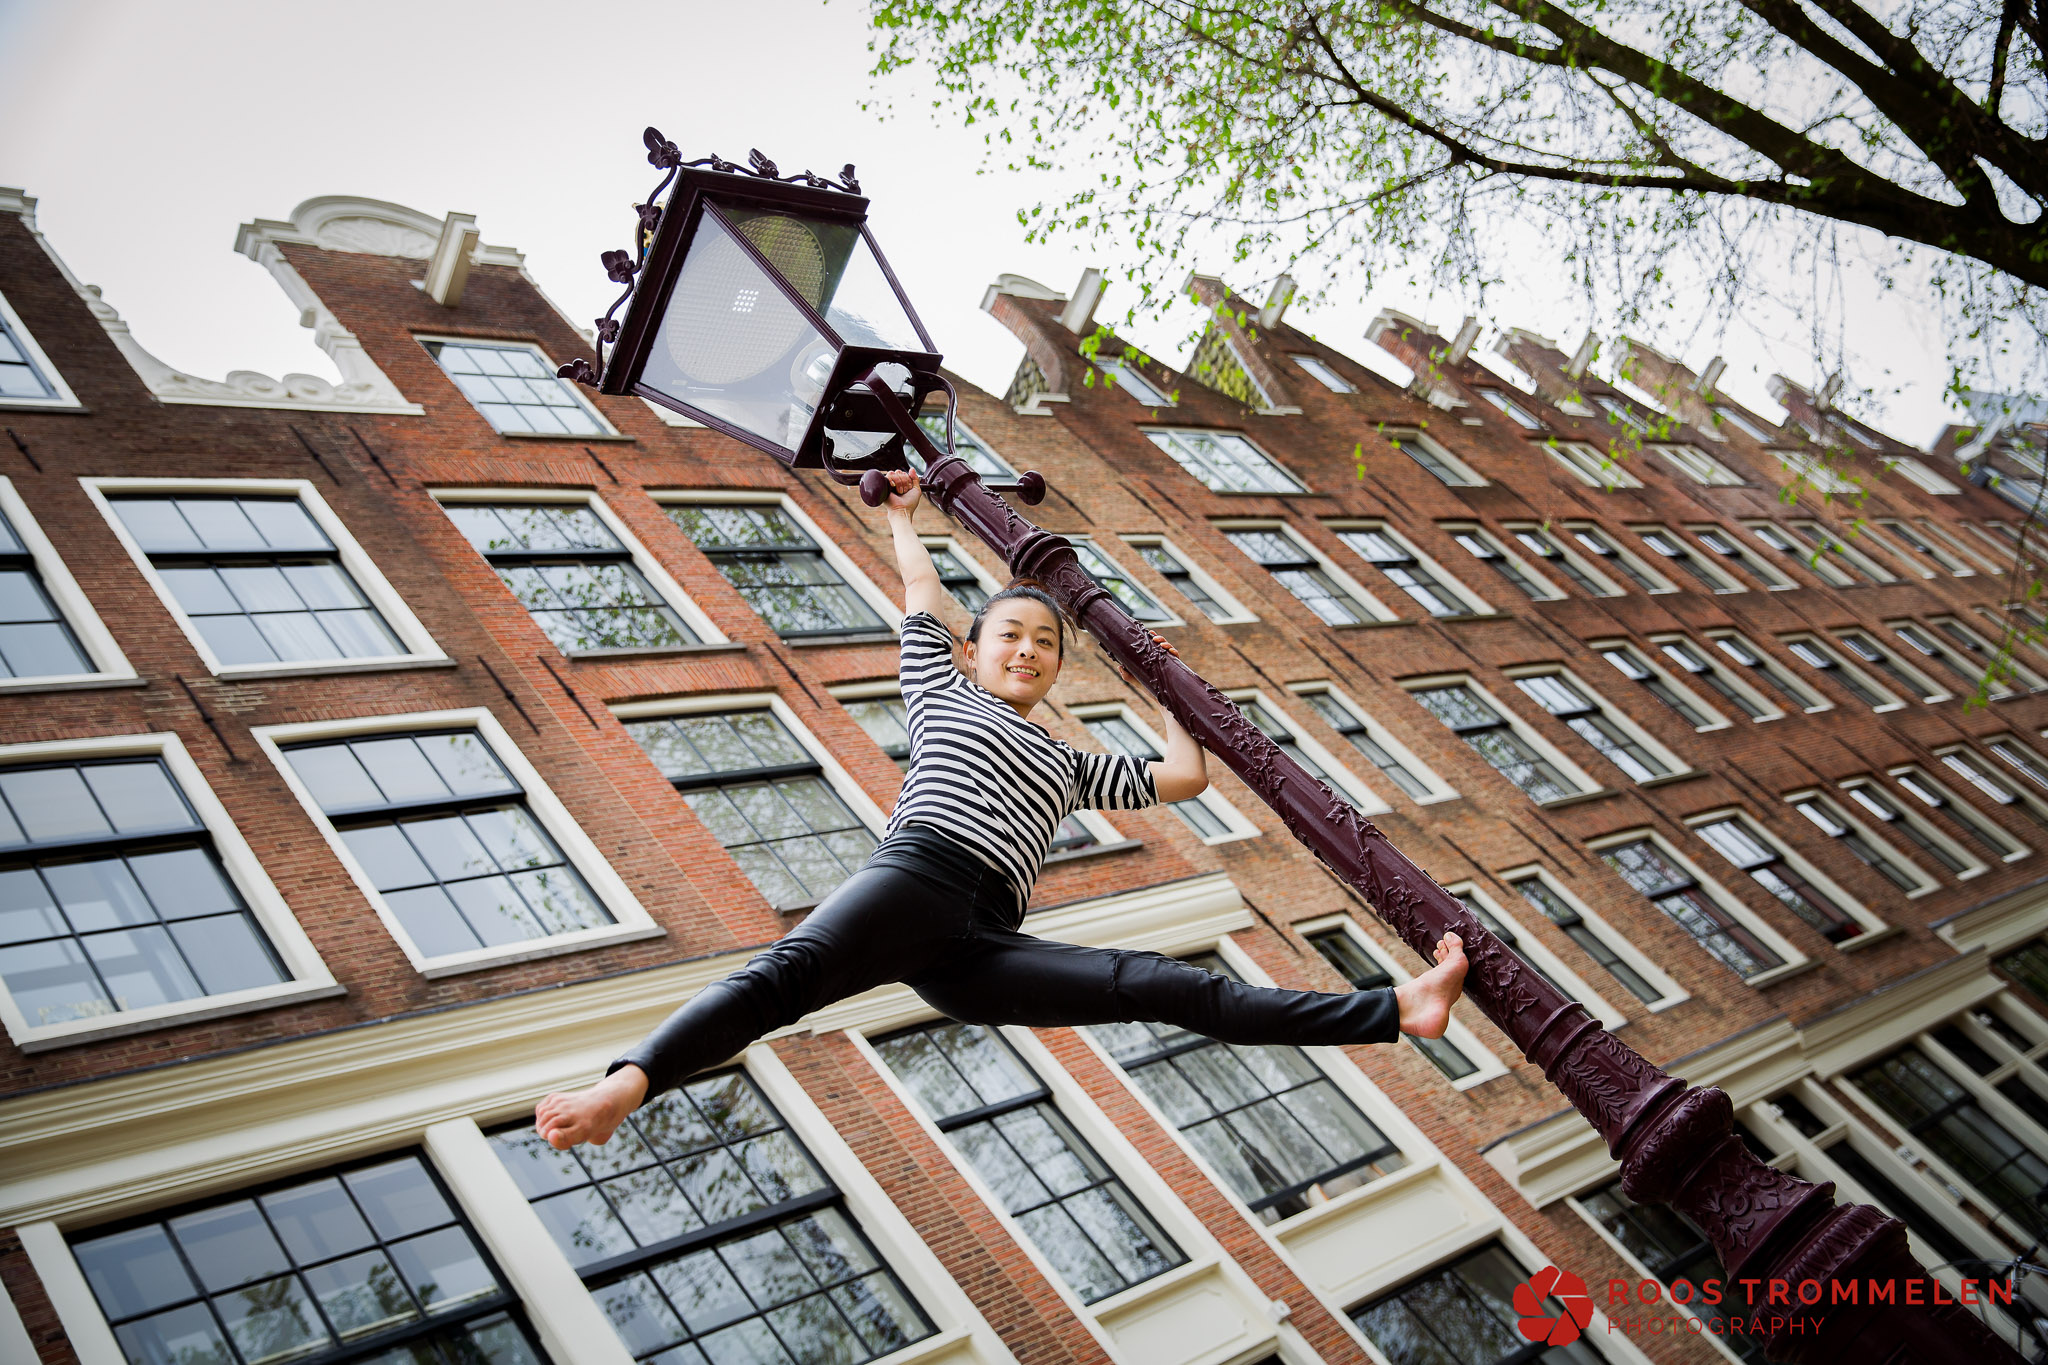 http://www.deshima-air.com/wp-content/uploads/2017/08/20170518_-Erika-Amsterdam-c-Roos-Trommelen-05-klein.jpg